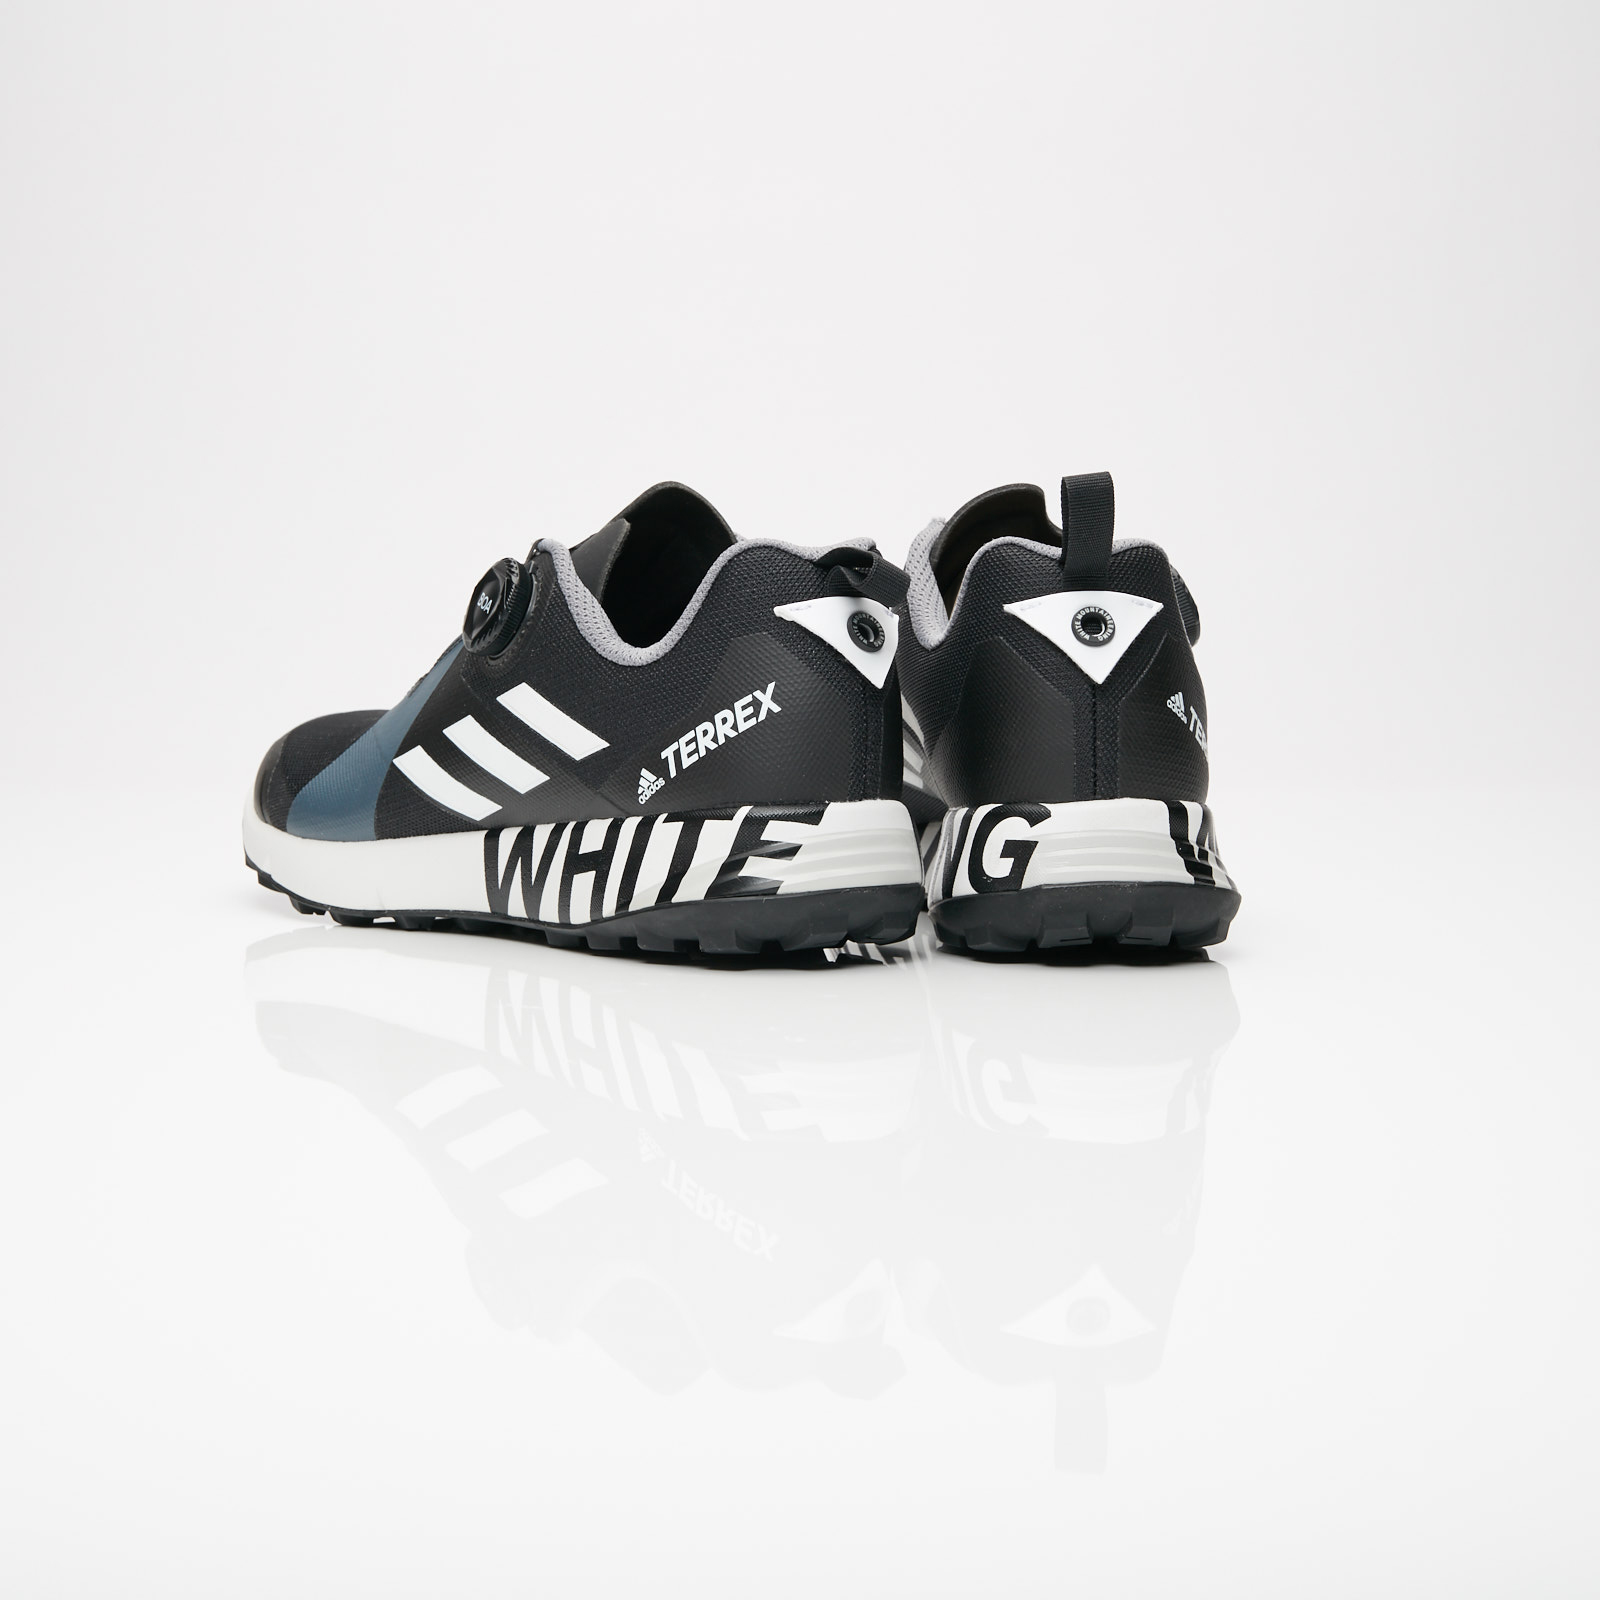 adidas WM Terrex TWO BOA Bb7743 Sneakersnstuff I